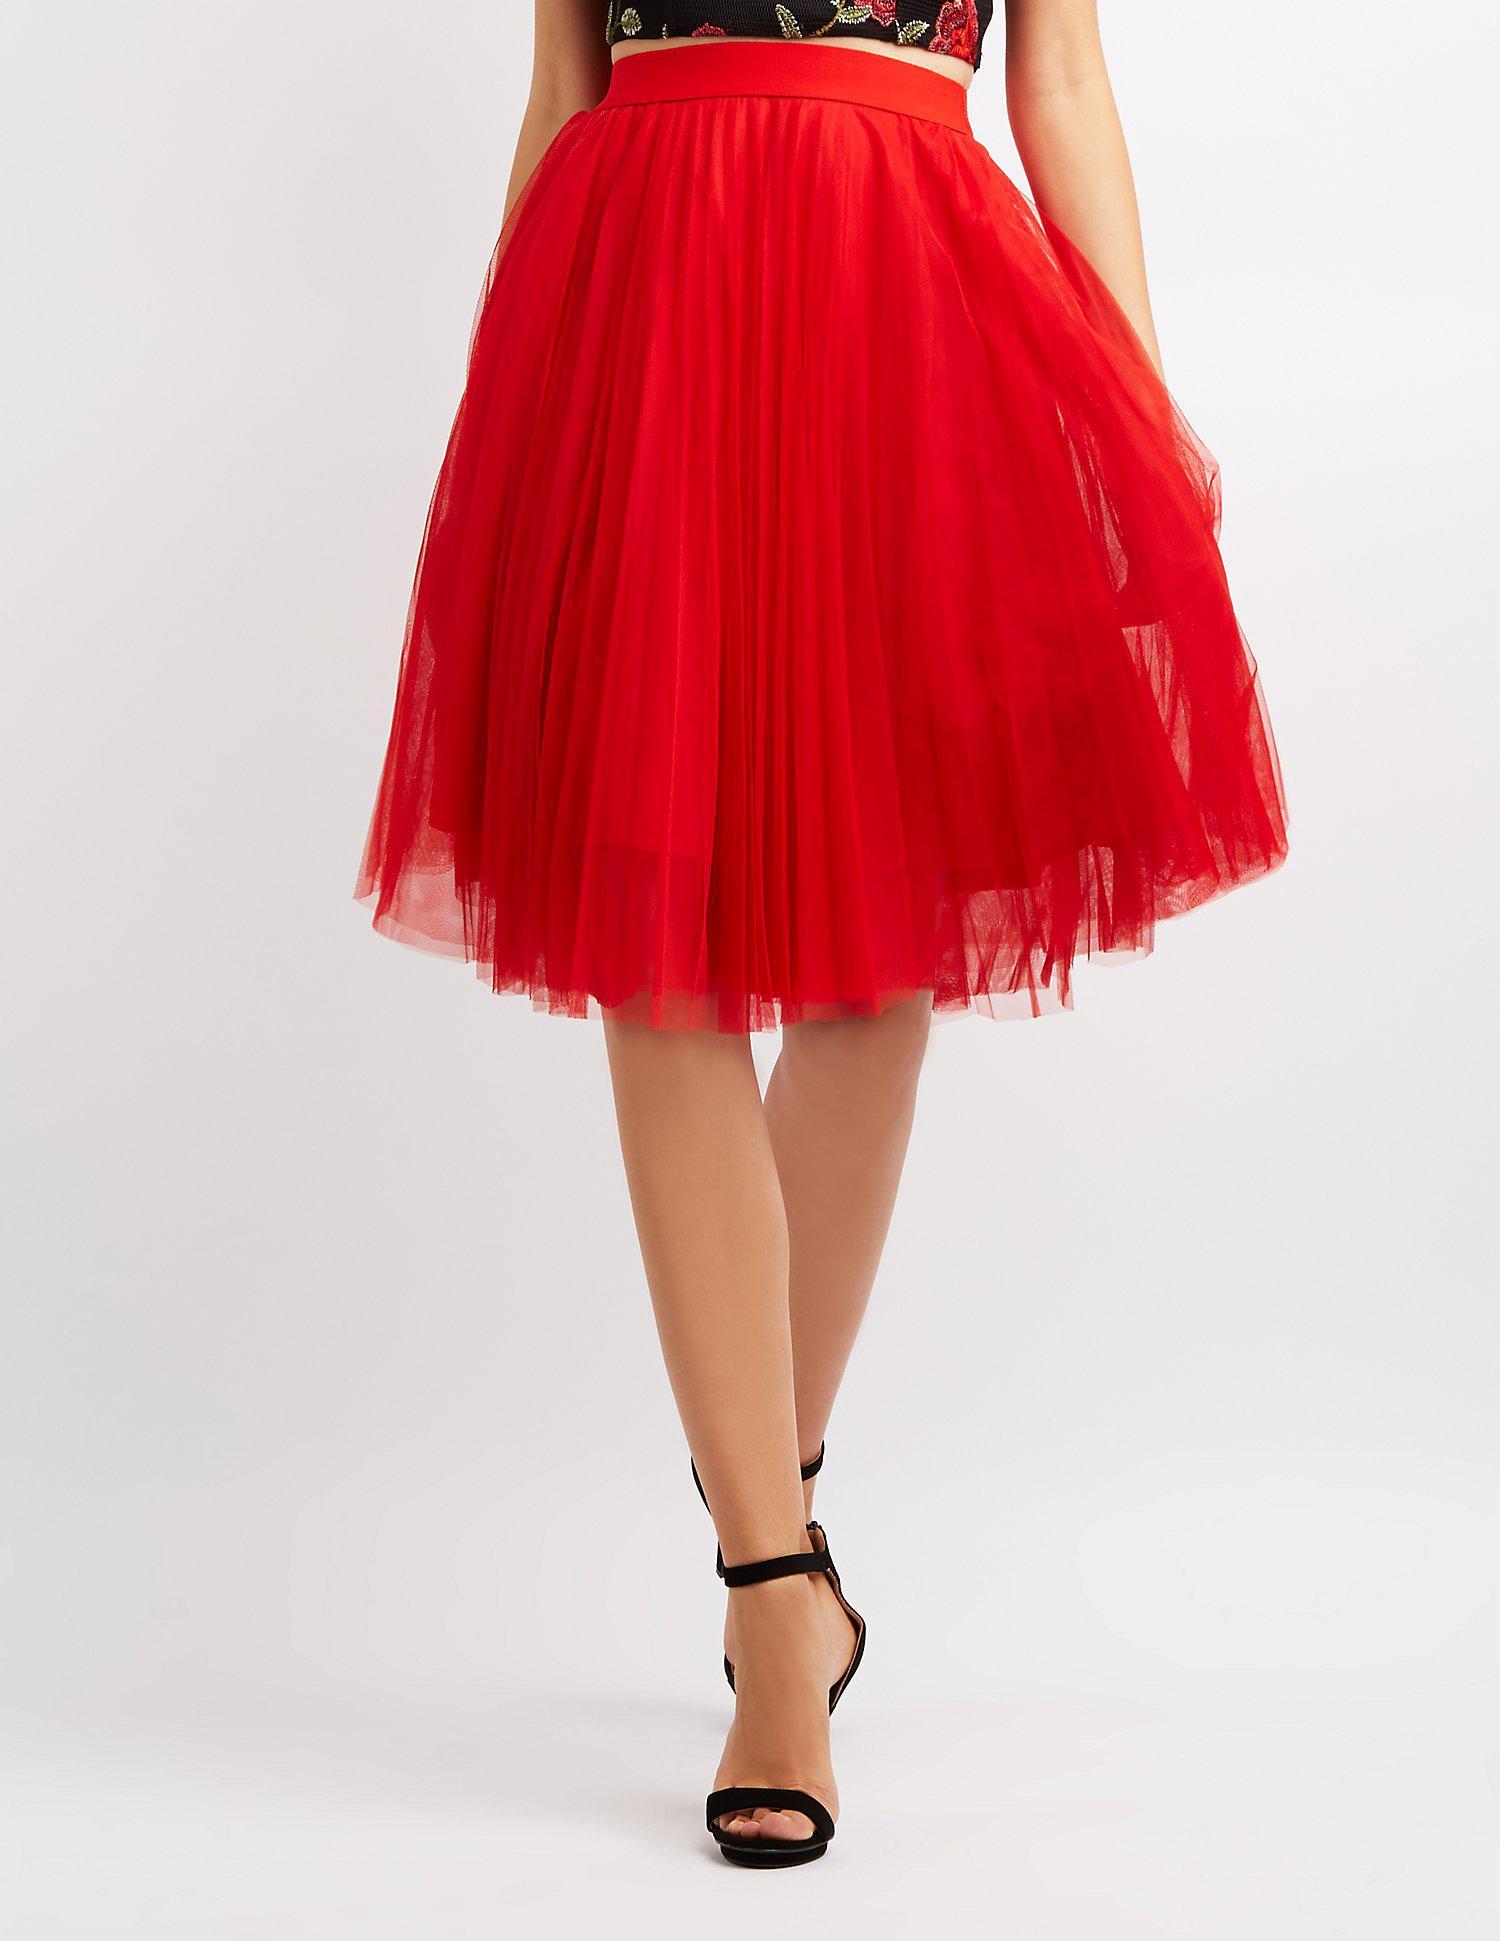 05800ffa3 Lyst - Charlotte russe Tulle Full Midi Skirt in Red